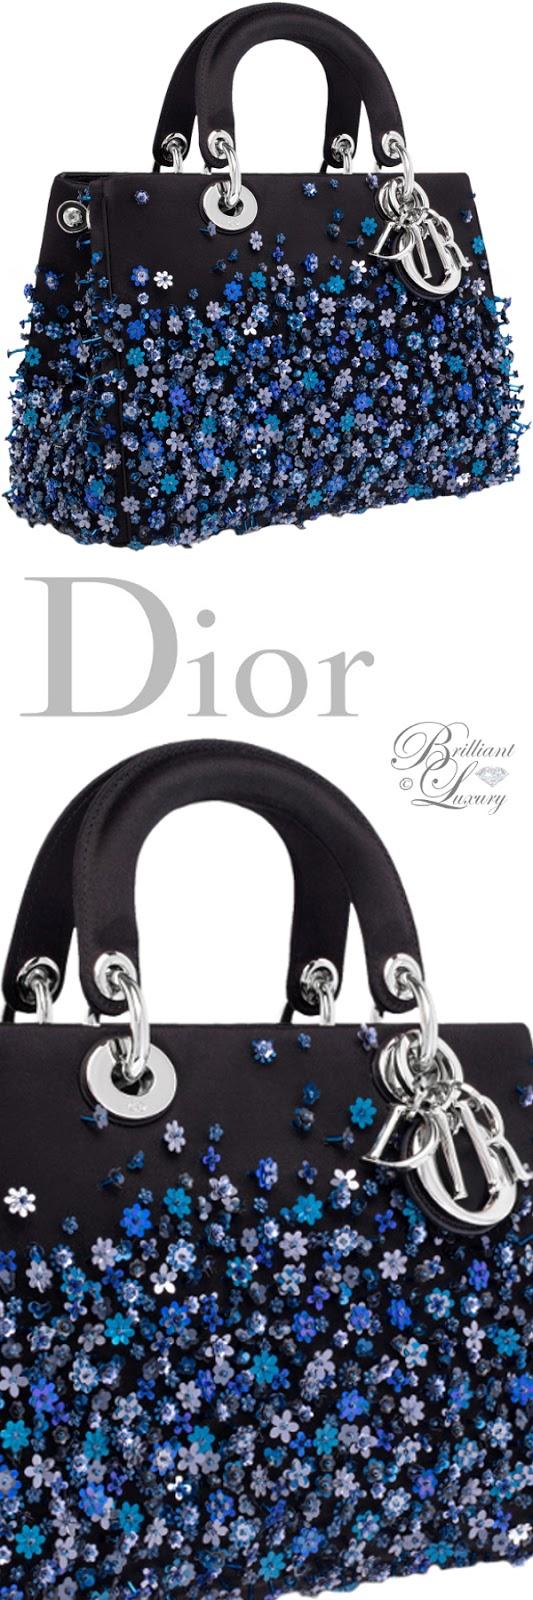 Brilliant Luxury ♦ Dior embroidered Lady Dior bag